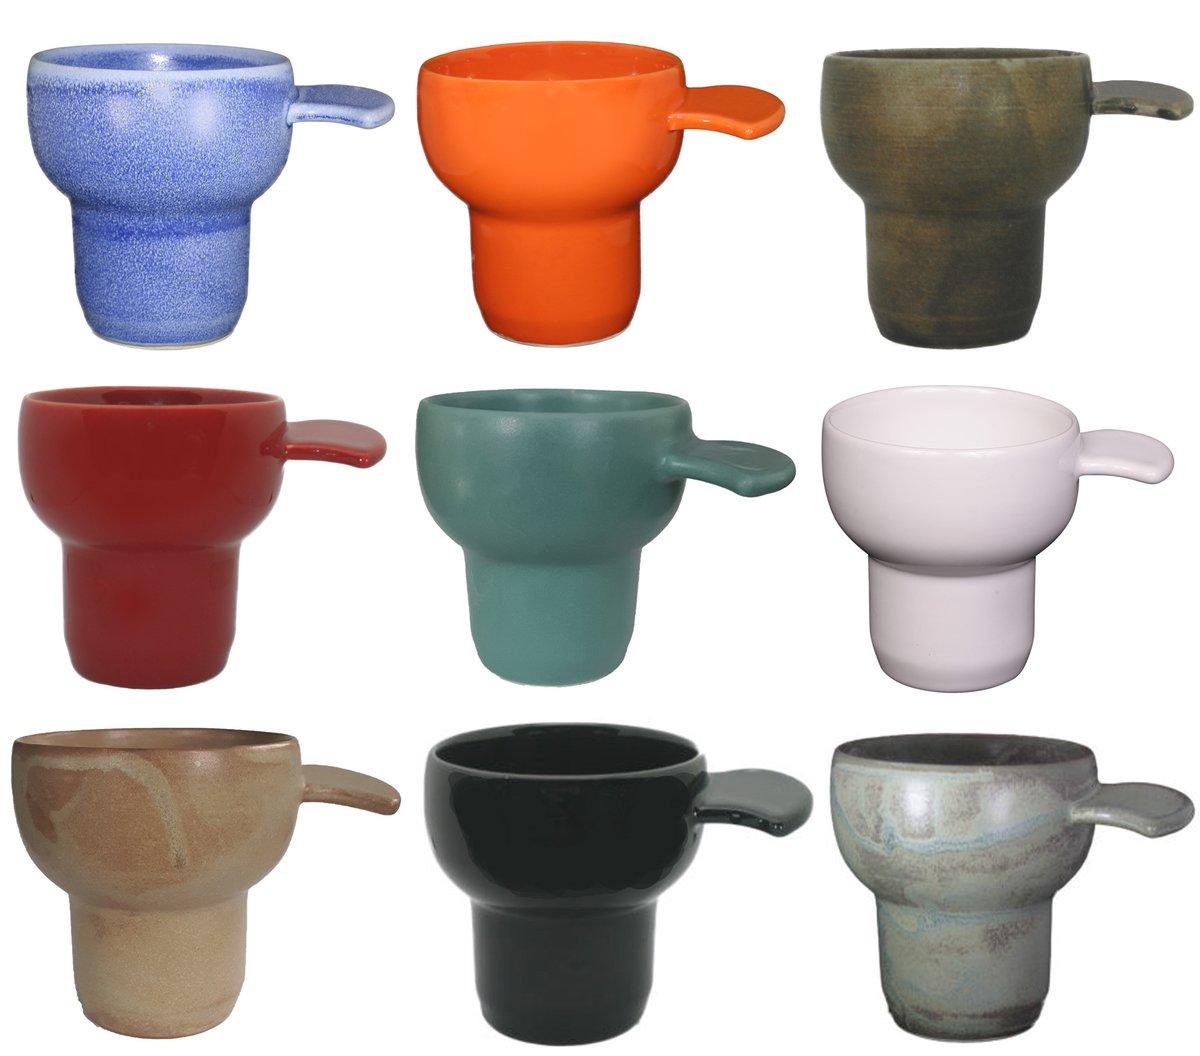 Flange Grip - 2 Stoneware Cups